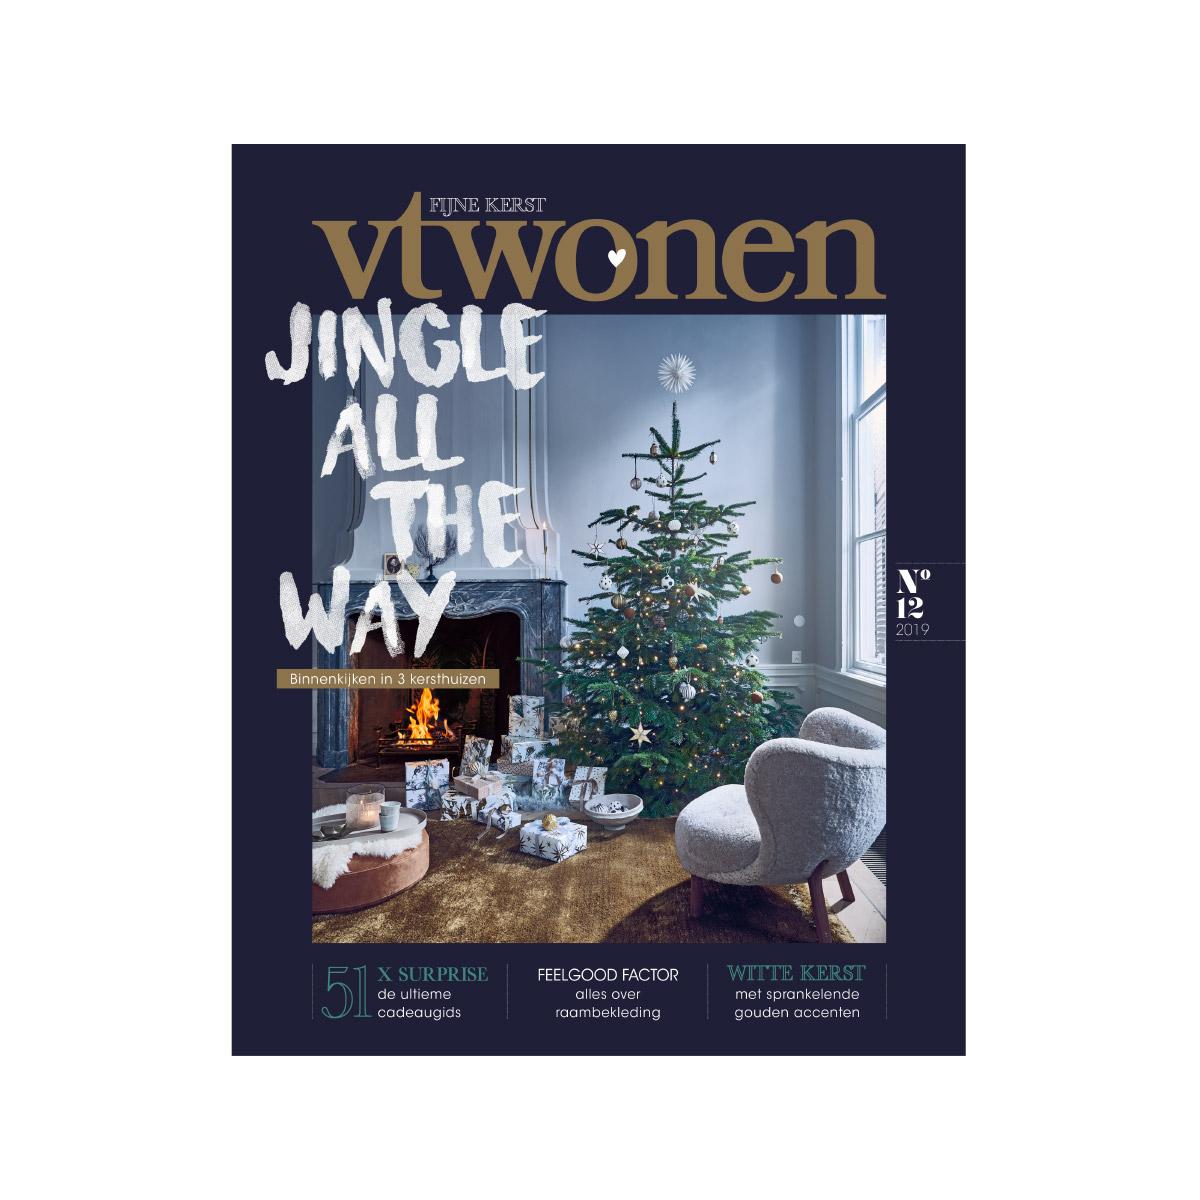 Stupendous Nu In De Winkels Vtwonen Magazine Nr 12 2019 Vtwonen Dailytribune Chair Design For Home Dailytribuneorg